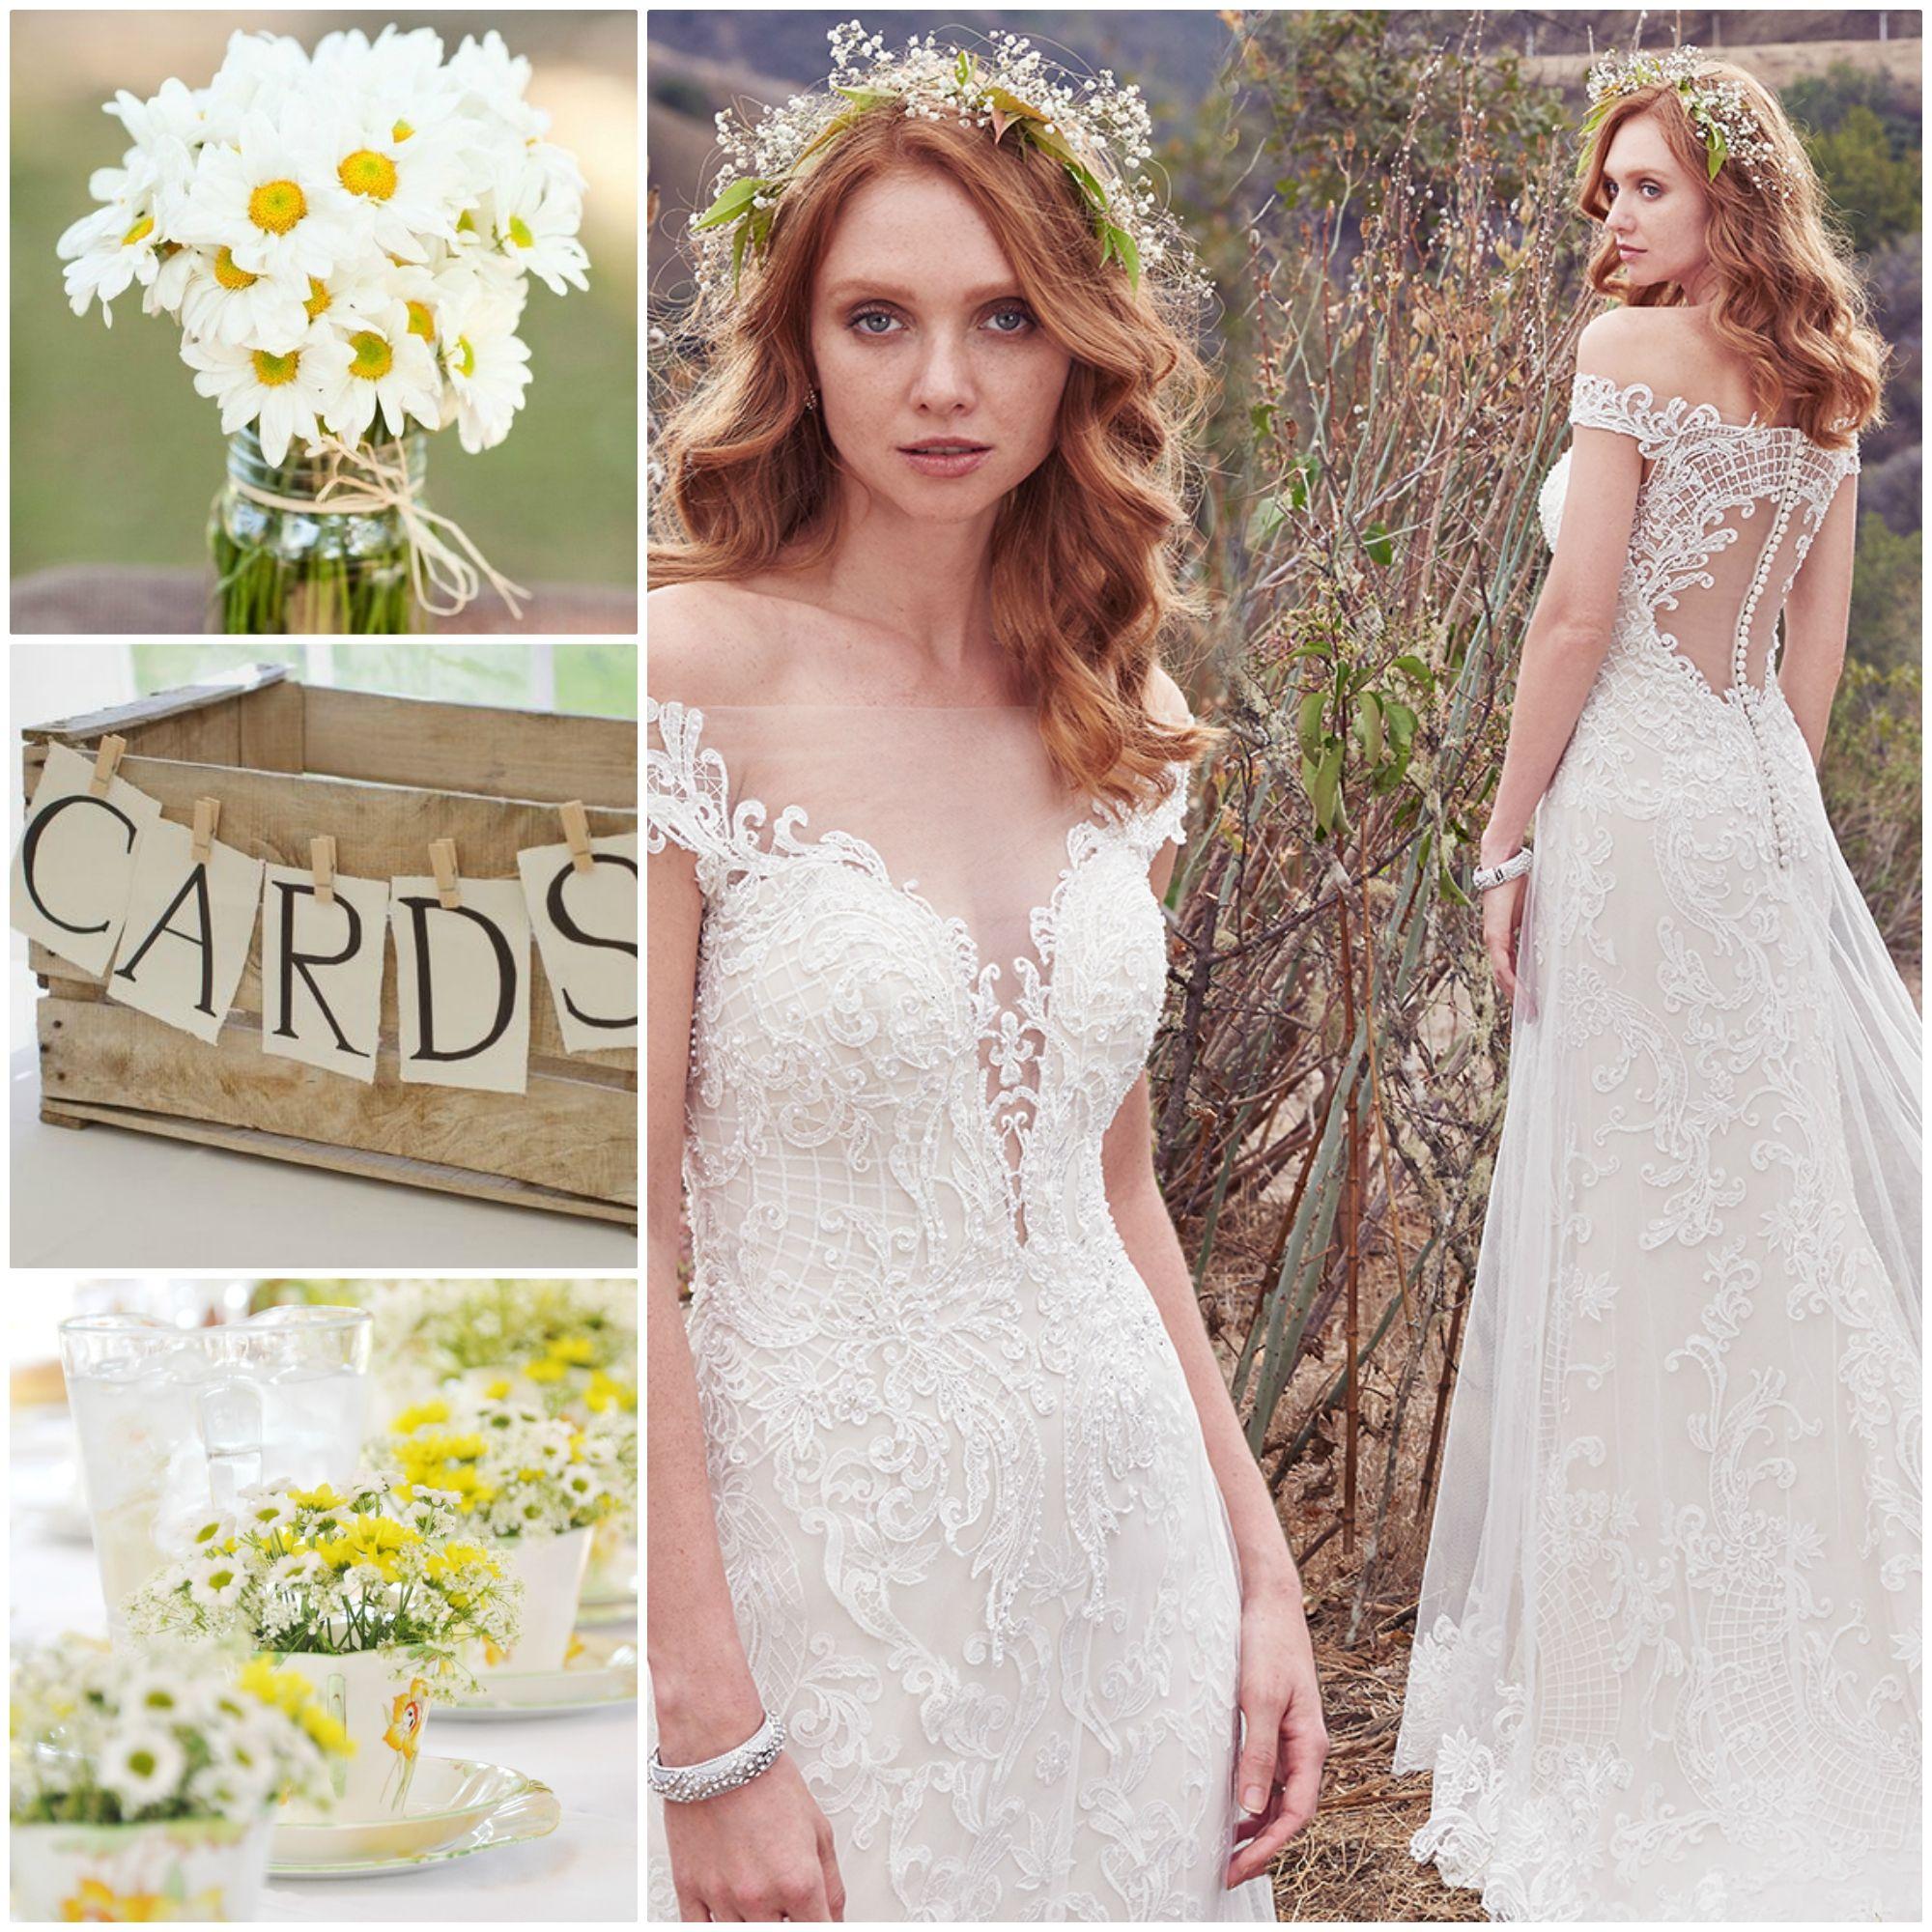 Wedding dresses by maggie sottero daisy bridal gown wedding ideas